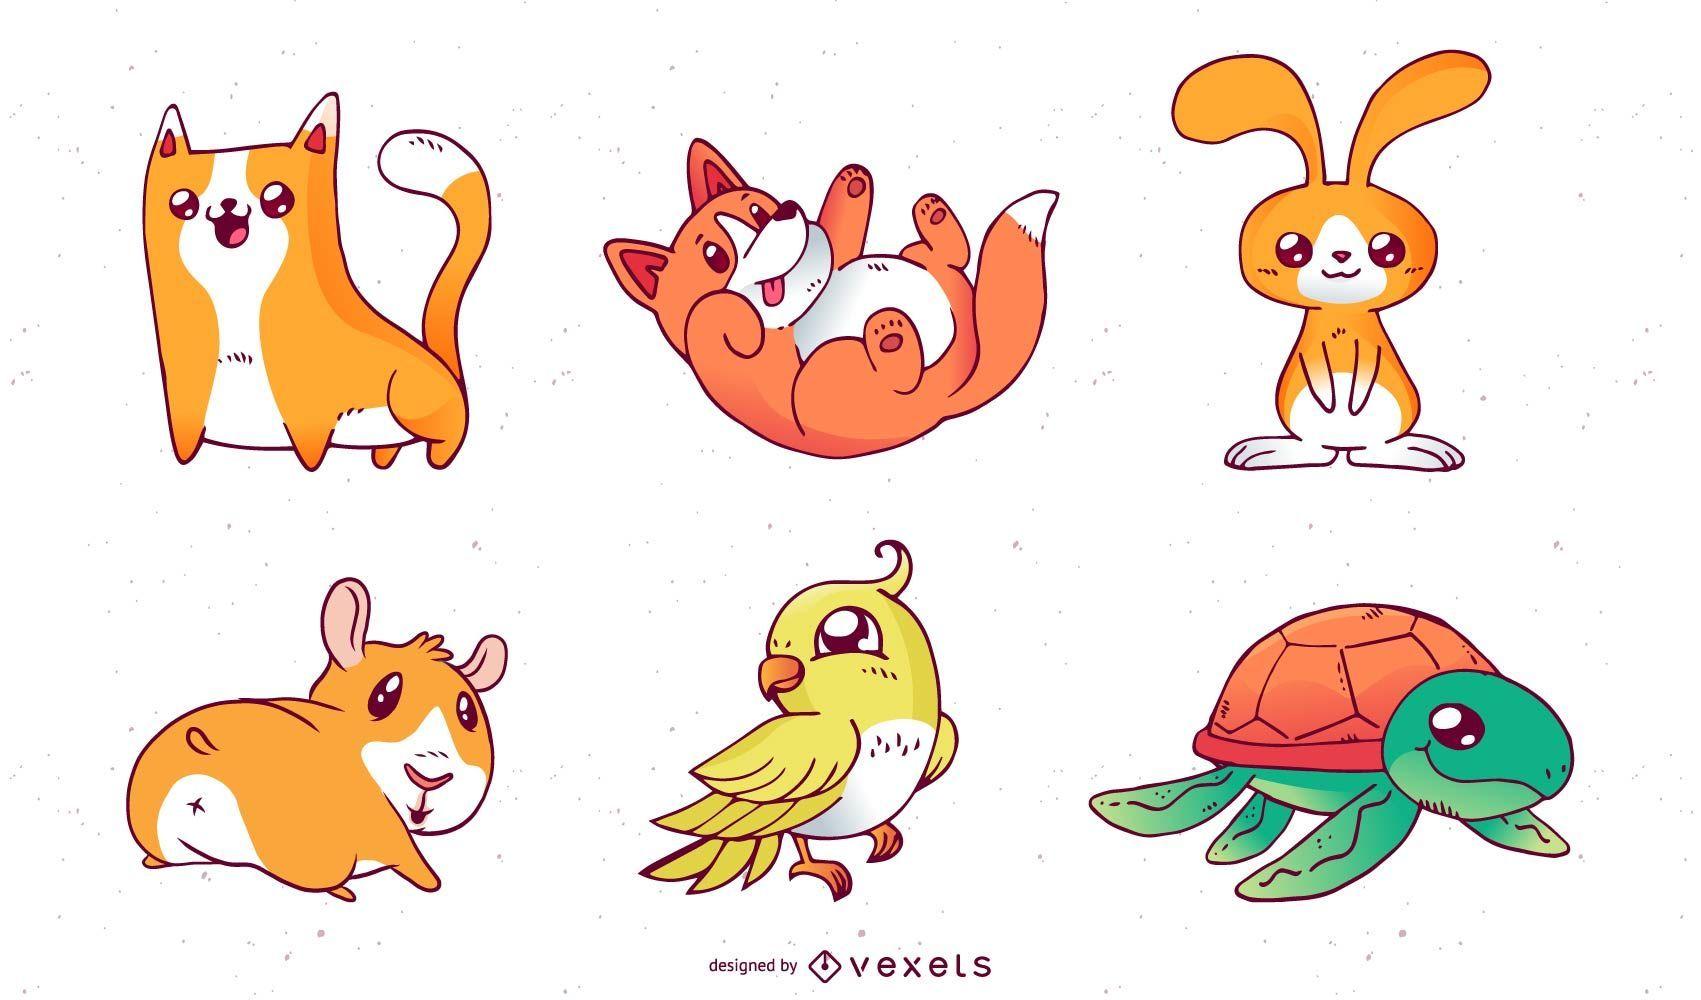 Vectores de mascotas de dibujos animados